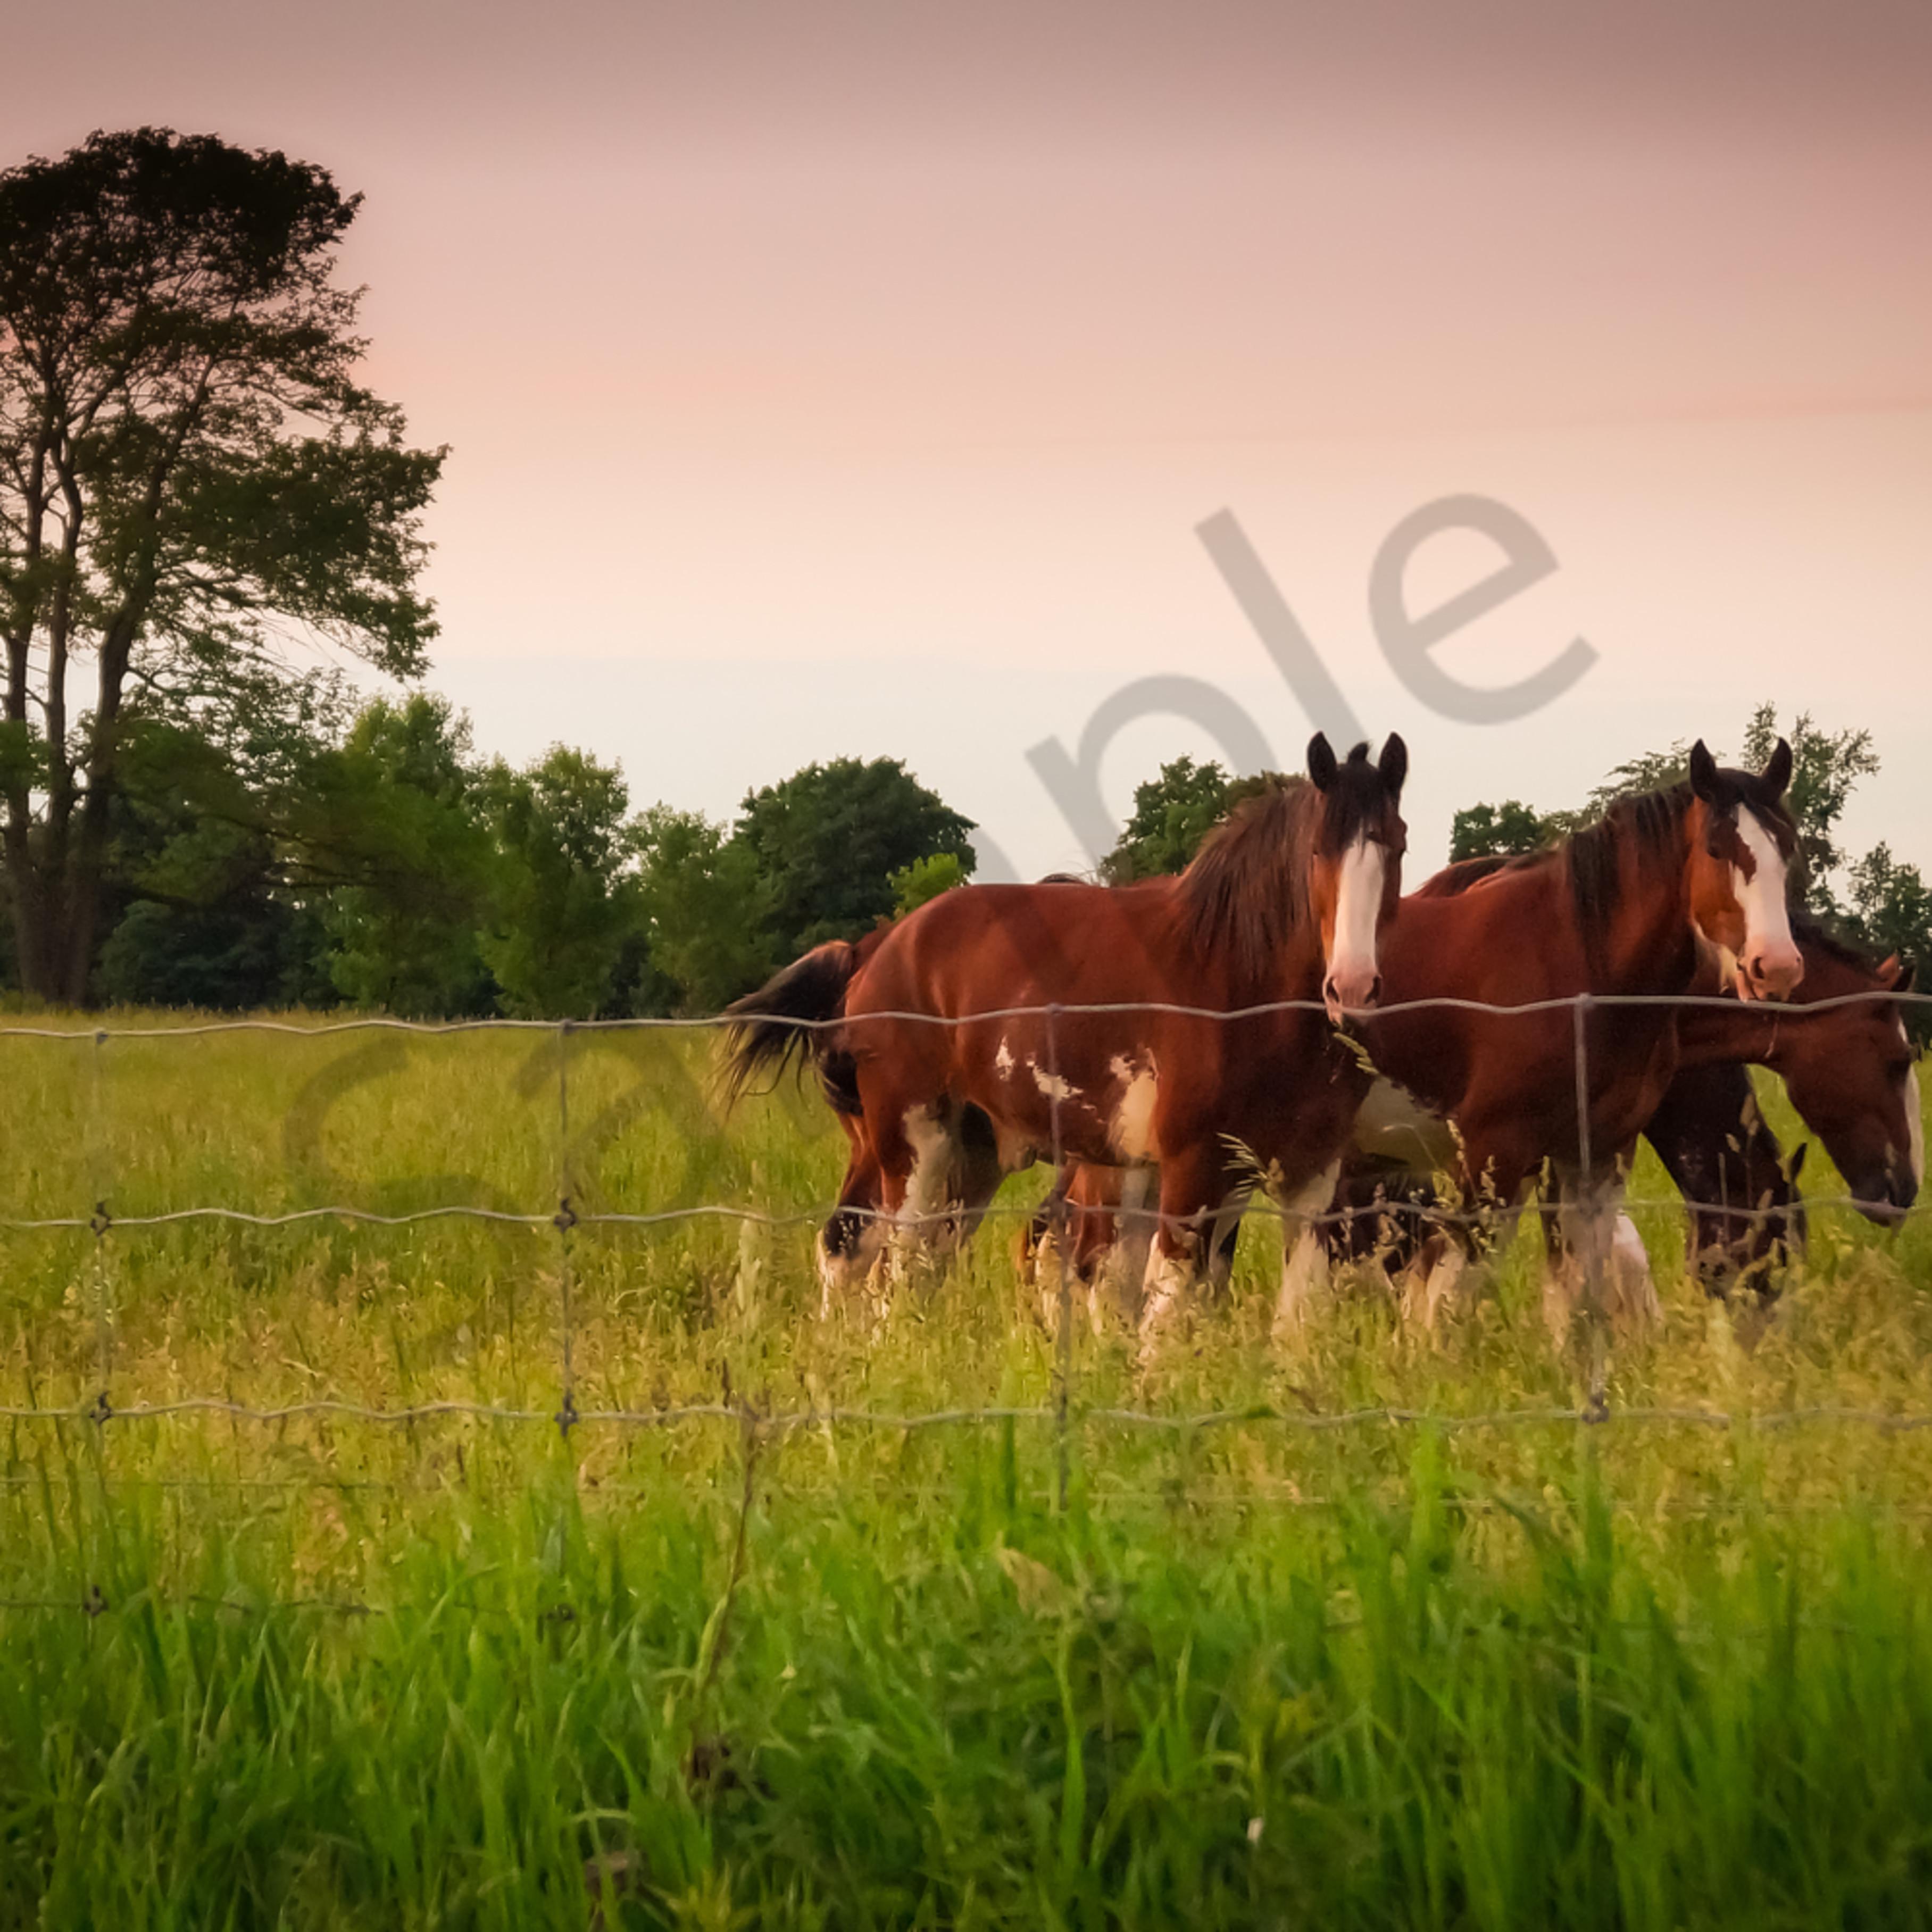 Horses at sunset fq6yxb